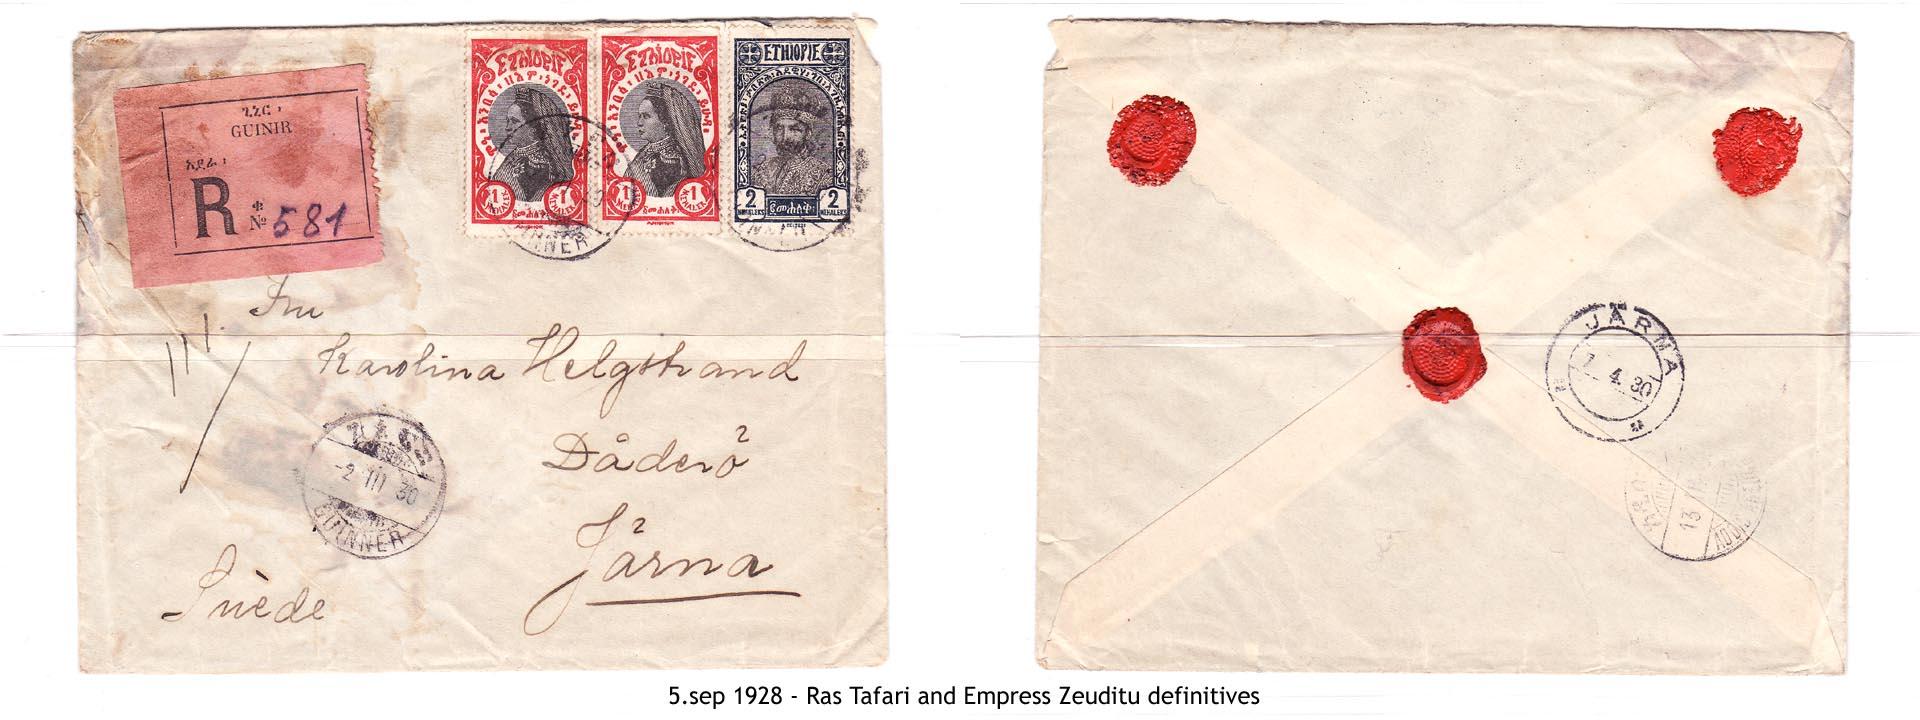 19280905 - Ras Tafari and Empress Zeuditu definitives